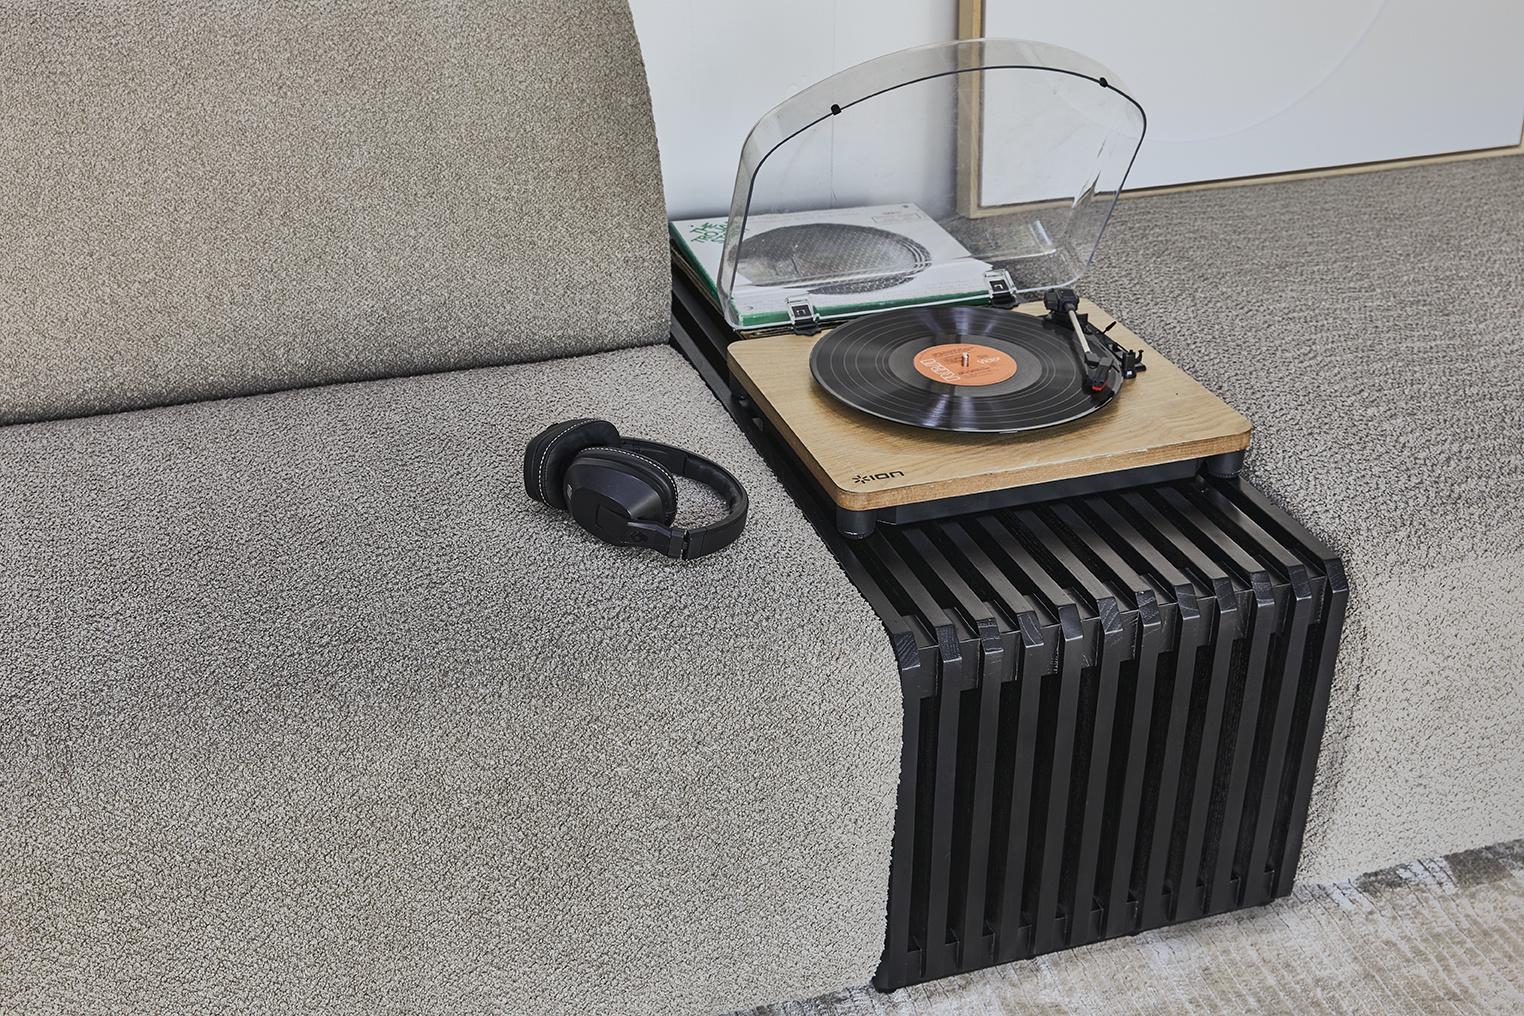 Hocker jax couch: element hocker small, ted, stone-5